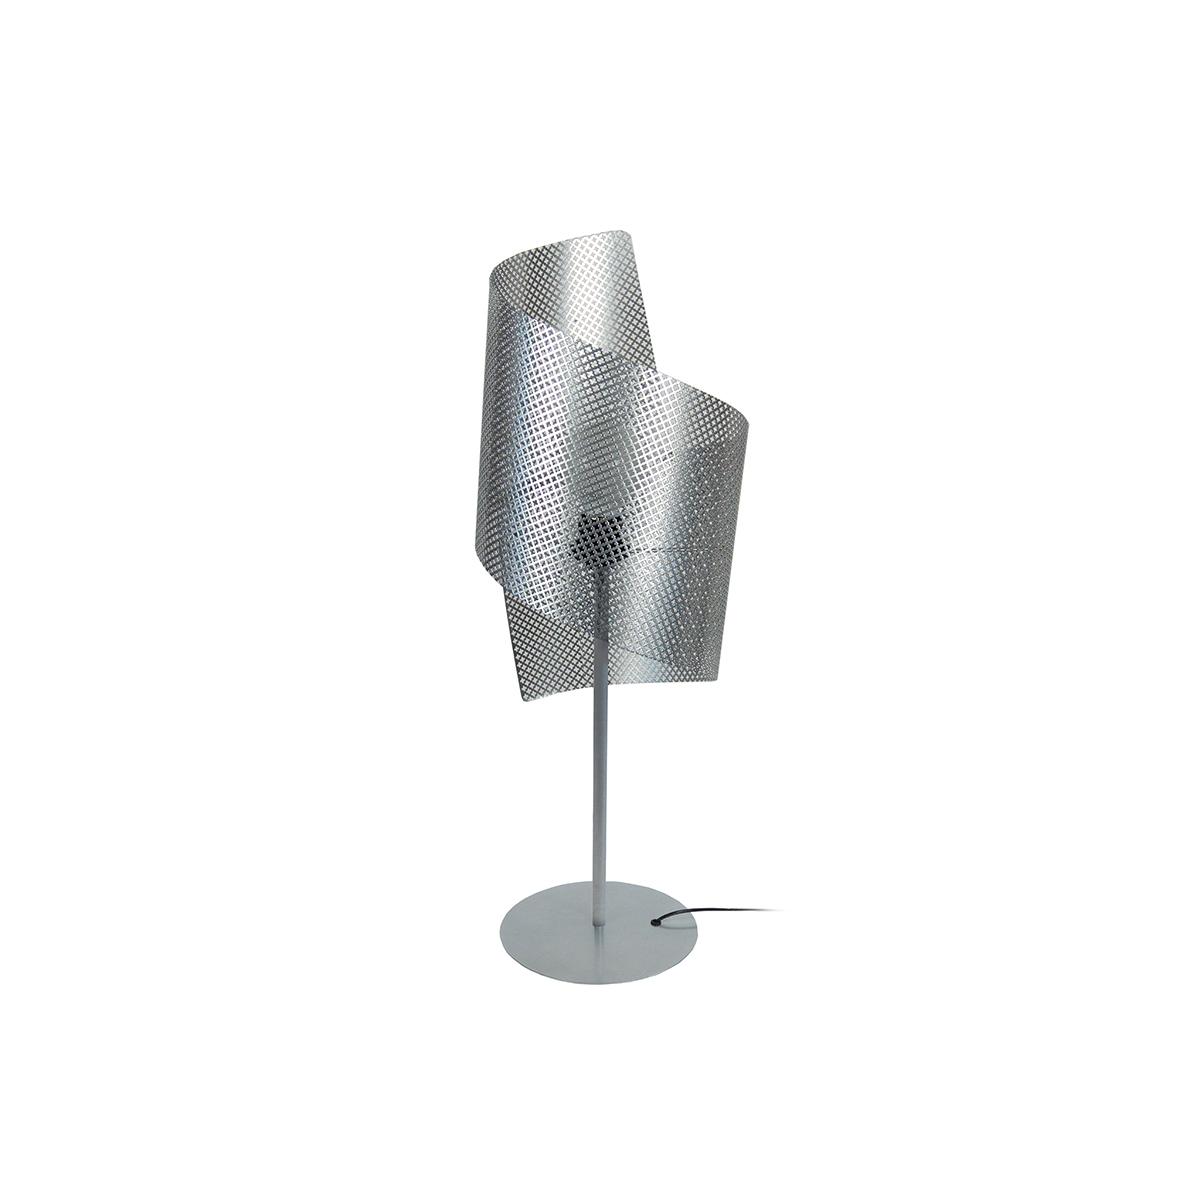 Lampada da tavolo design perforata CLOVER